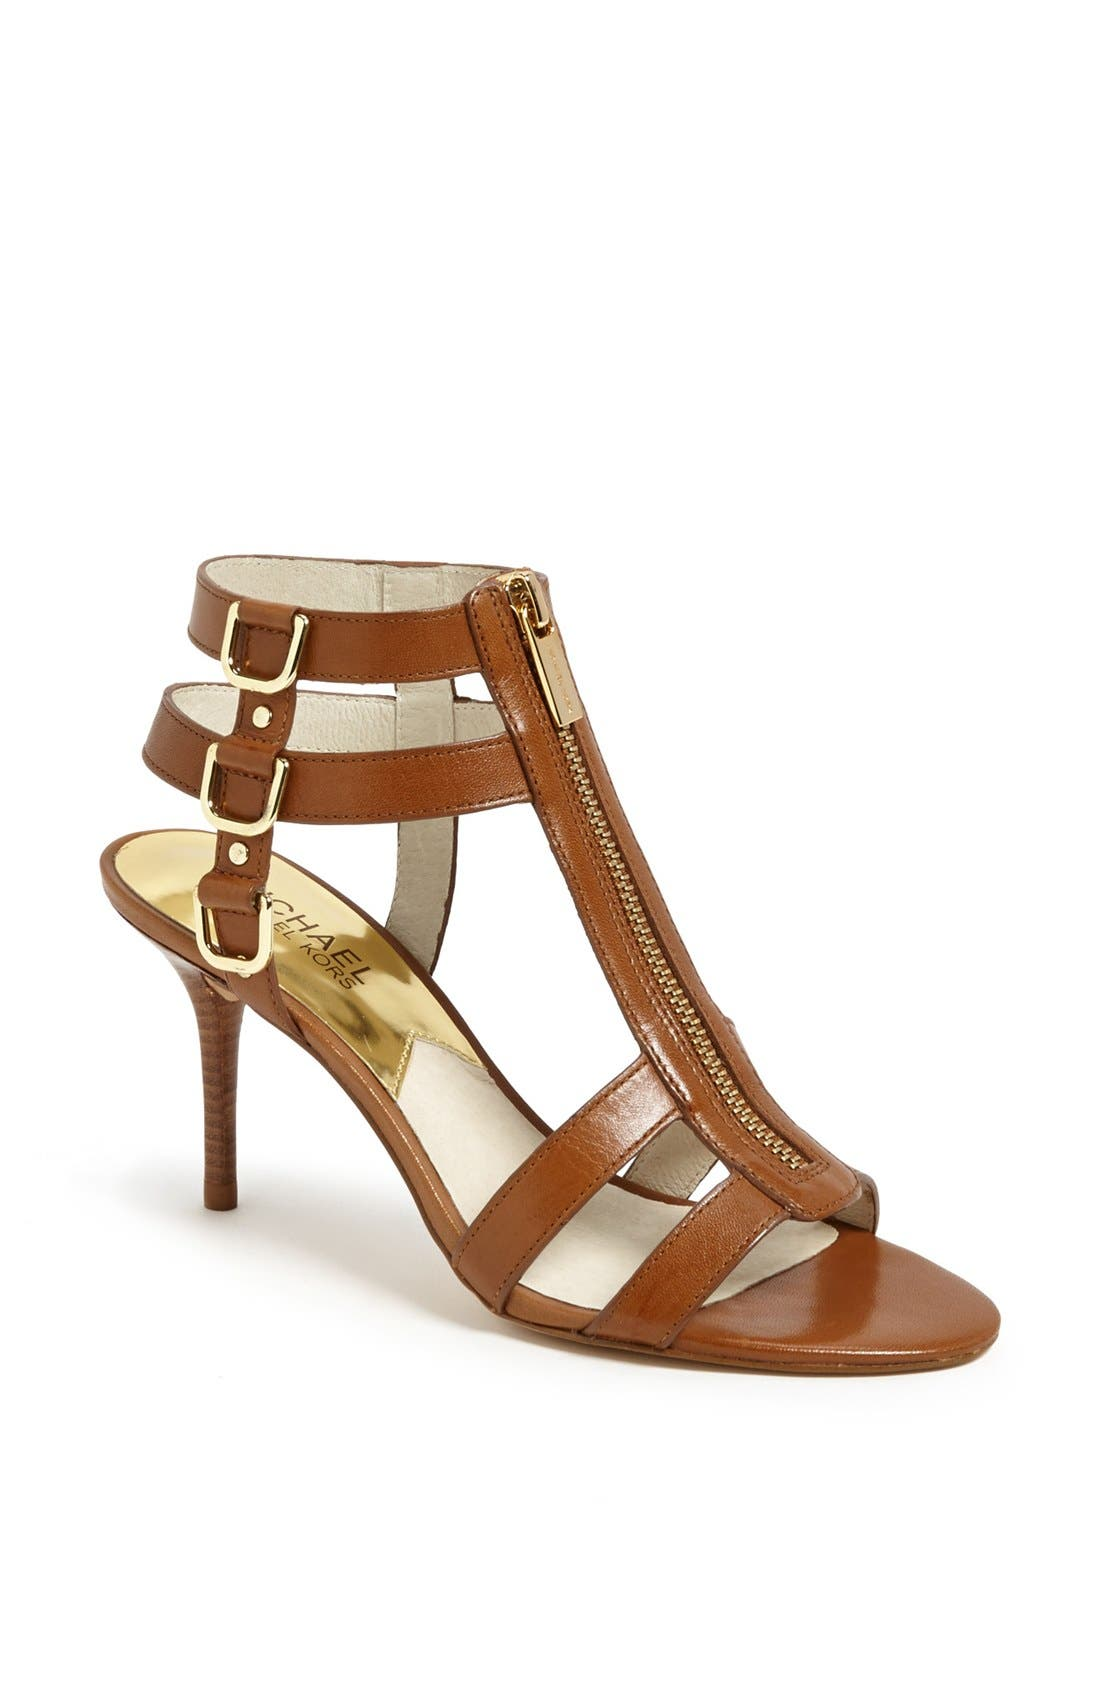 Main Image - MICHAEL Michael Kors 'Kennedy' Sandal